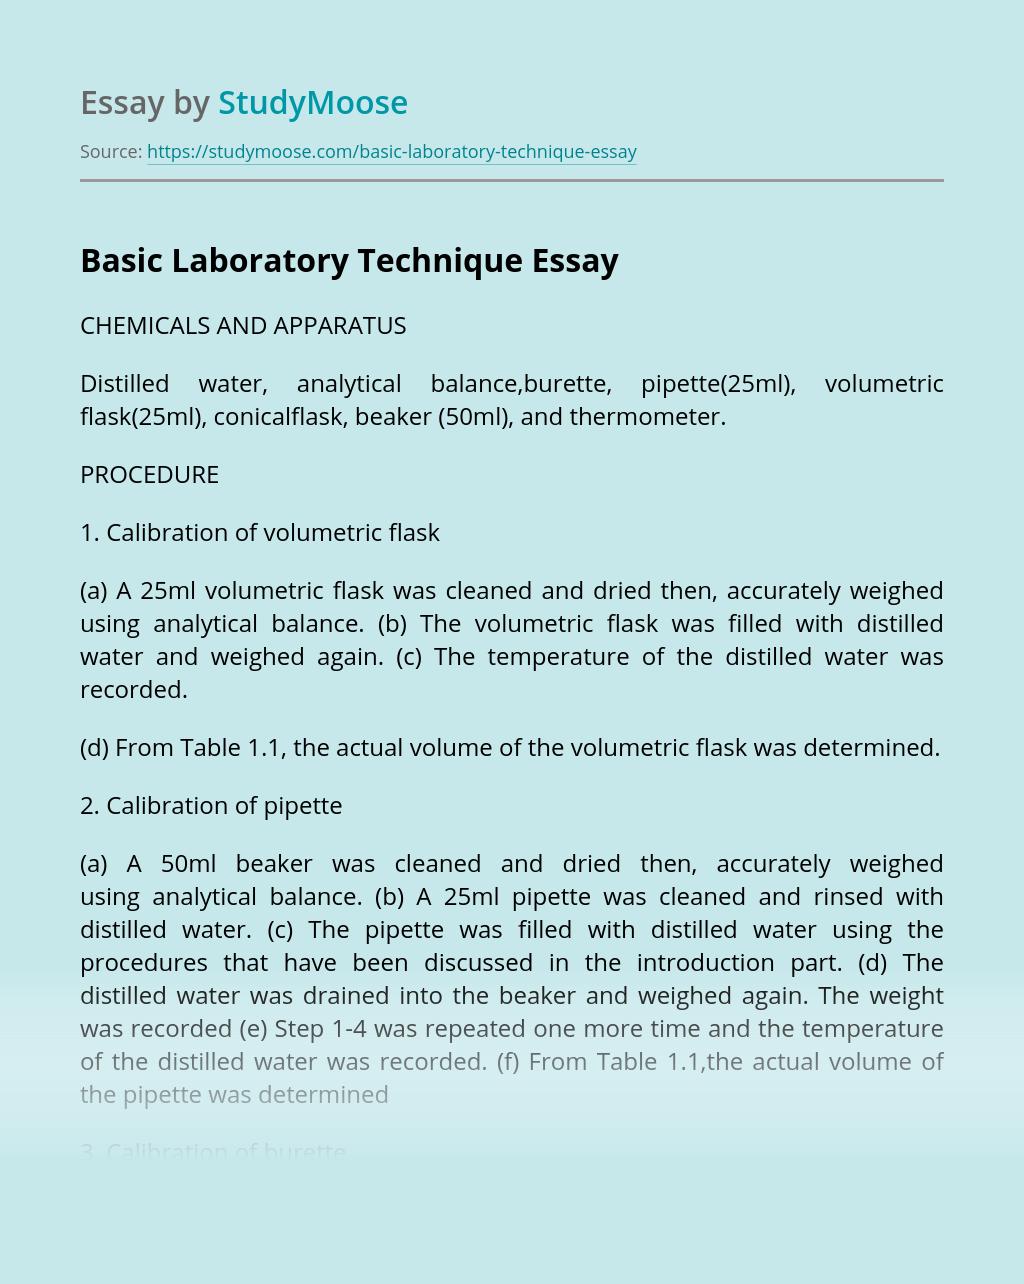 Basic Laboratory Technique